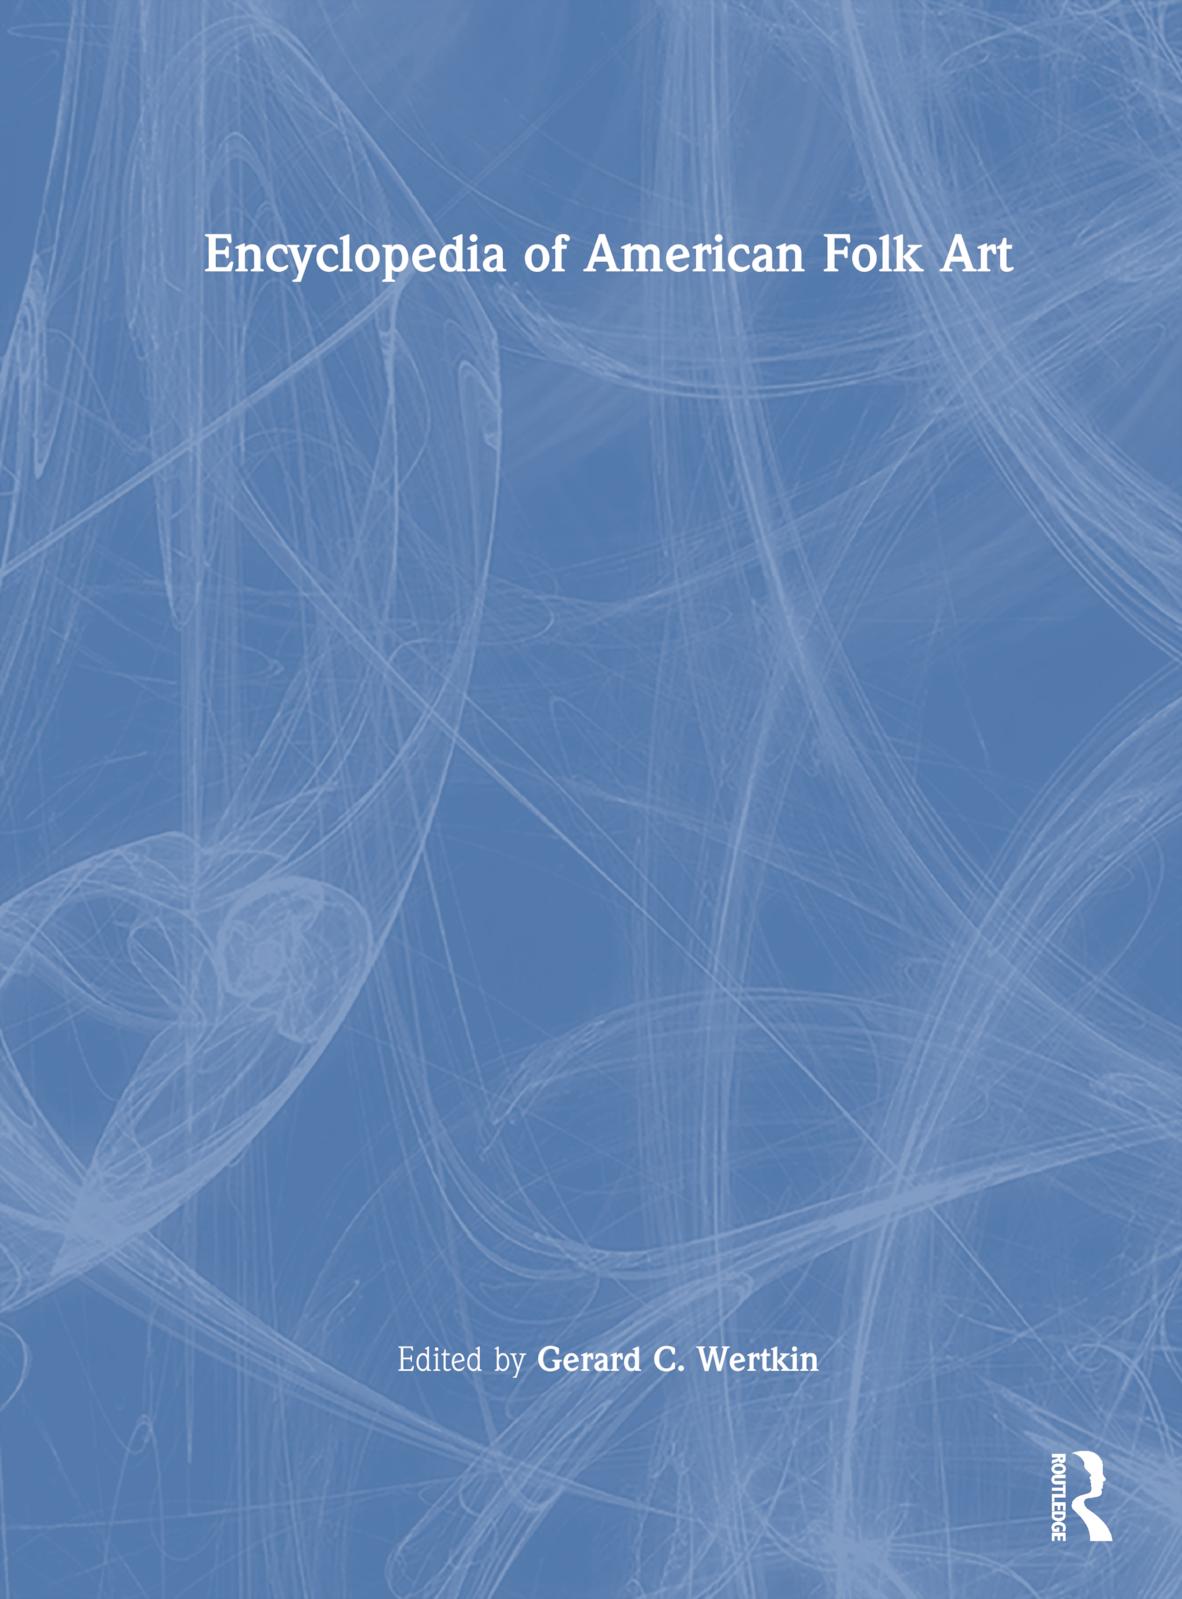 Encyclopedia of American Folk Art: 1st Edition (Hardback) book cover